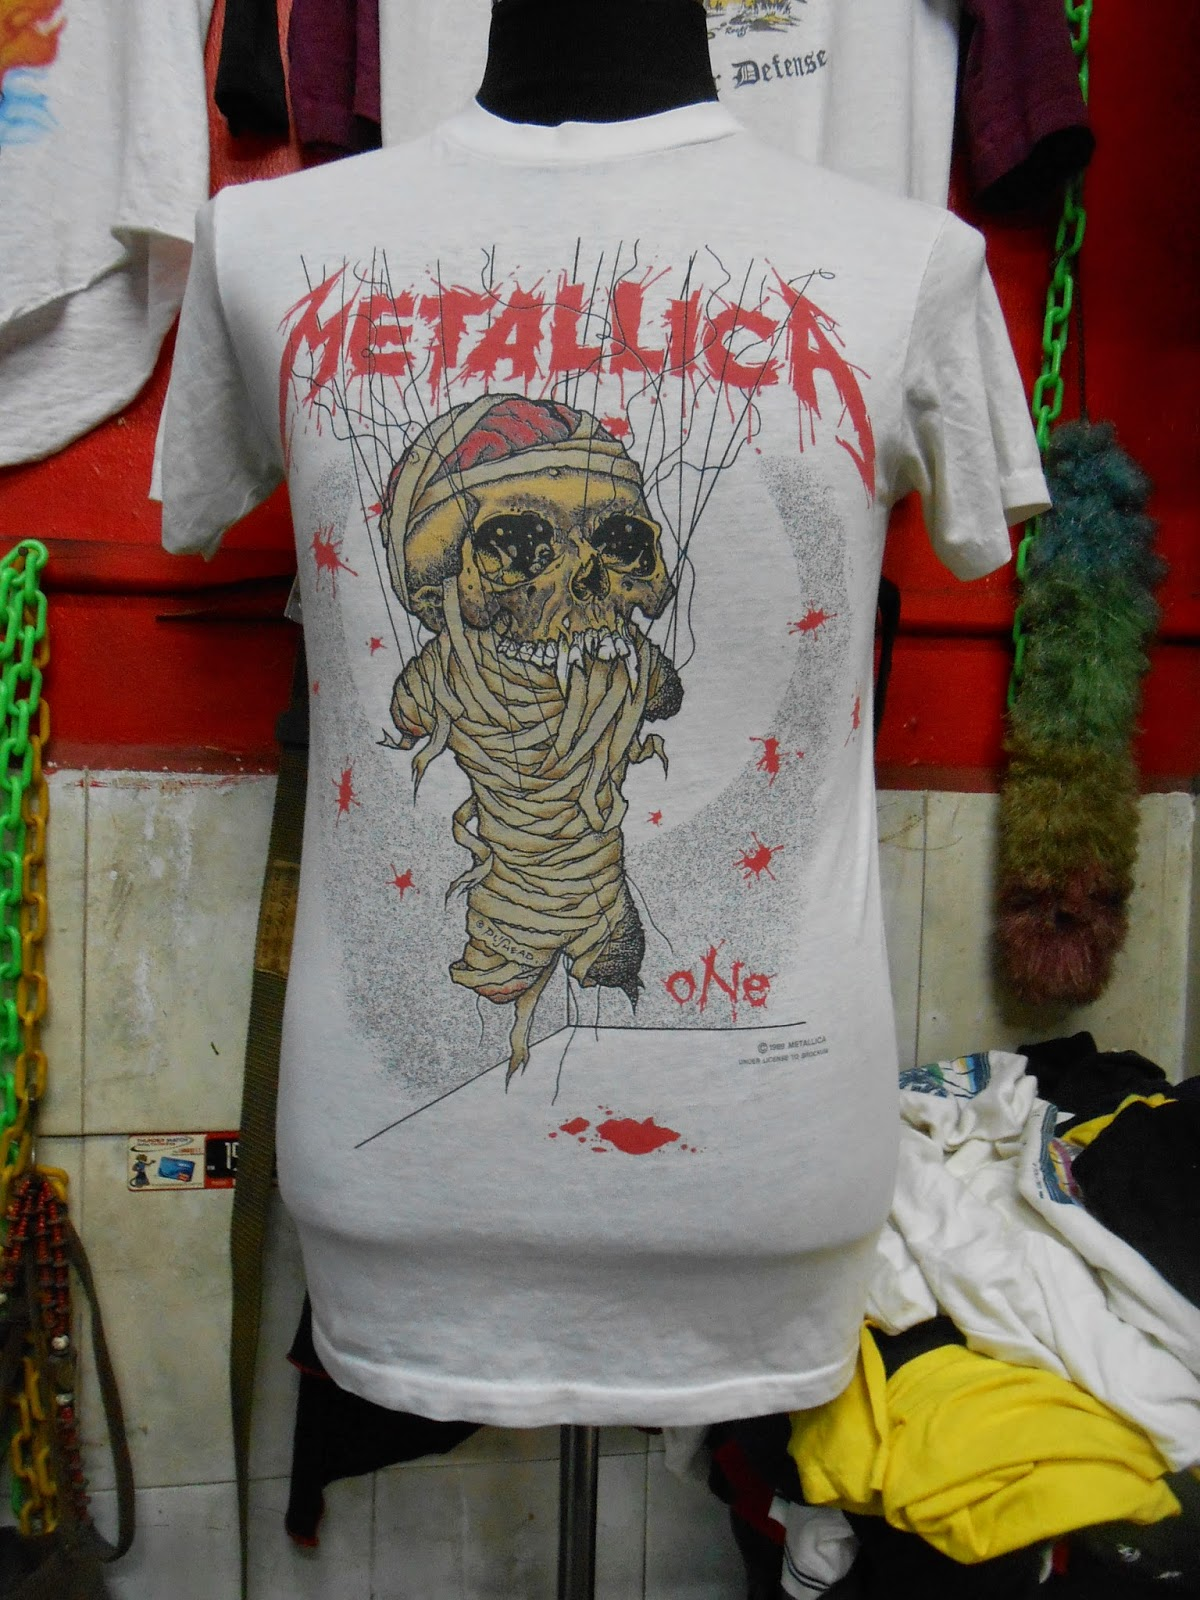 Daftar Harga Tendencies Tshirt Punk Rock Hitam S Update 2018 The Little Things She Needs Chinny 6l Navy Tsn0001299c0035 38 Trend Bundle September 2014 Vtg Metallica 89 5050 Band Tshirtsold